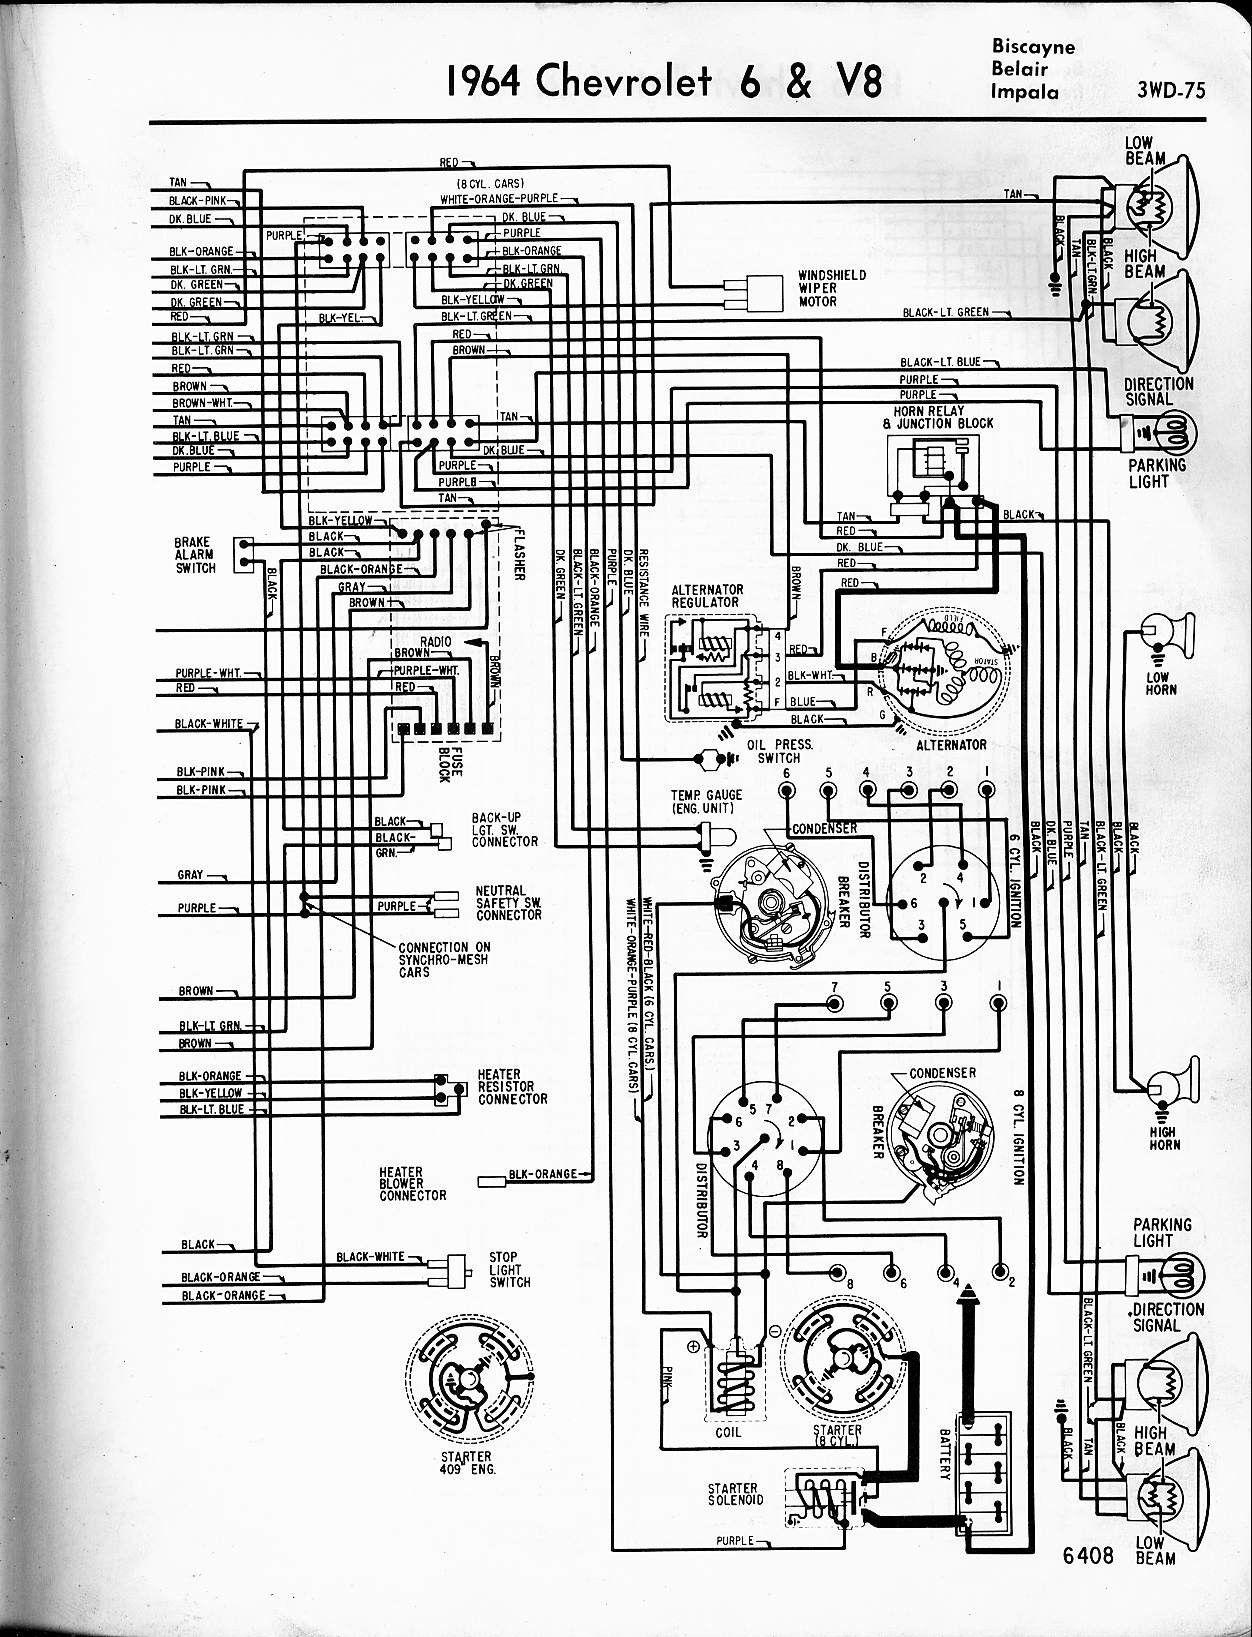 2002 Chevy Impala Engine Diagram | Chevy impala, Impala, Diagram | 2005 Impala Engine Diagram |  | Pinterest